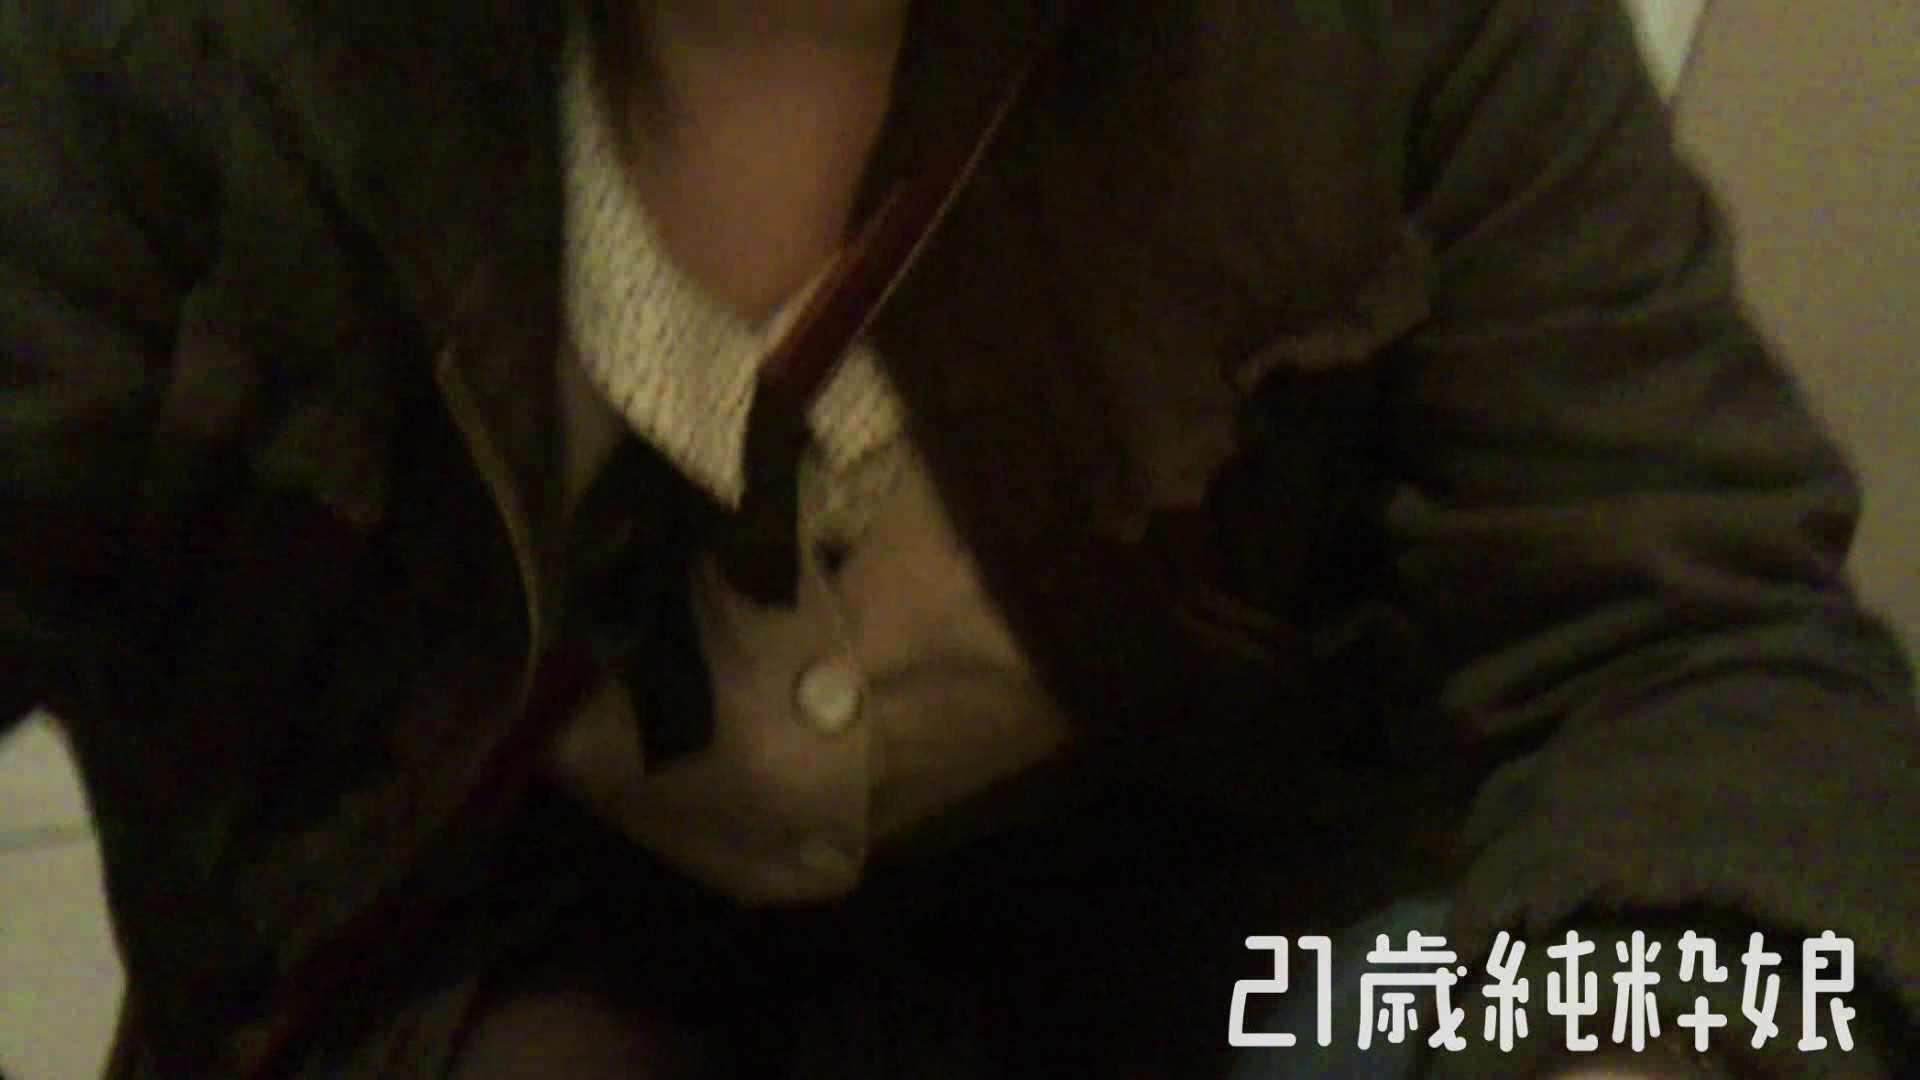 Gカップ21歳純粋嬢第2弾Vol.5 OLヌード天国  110PIX 74